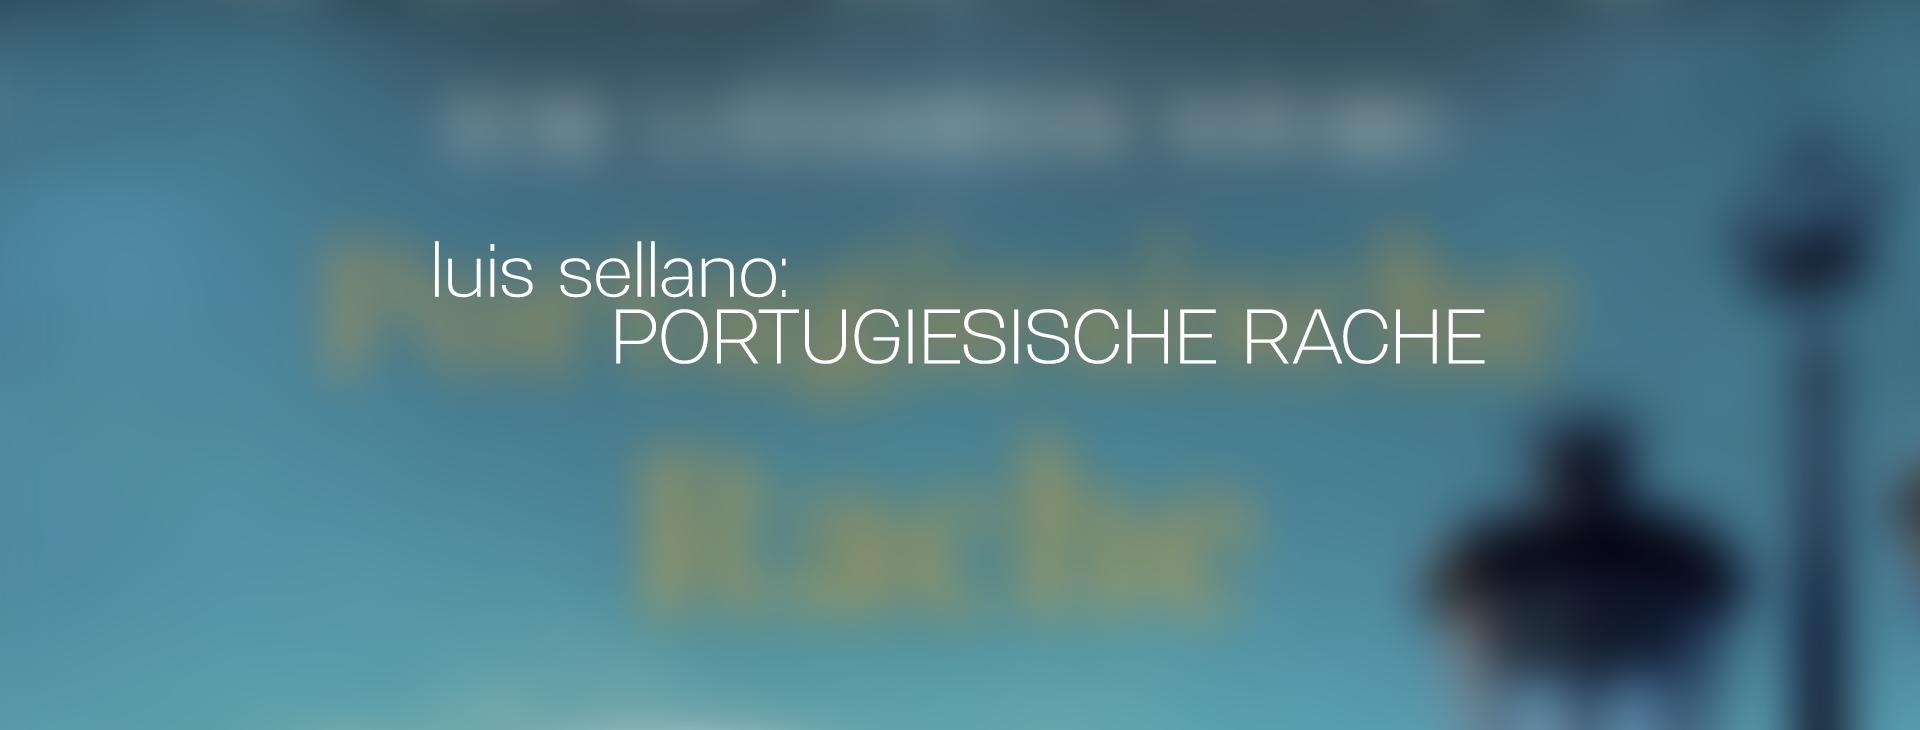 luis sellano portugiesische rache